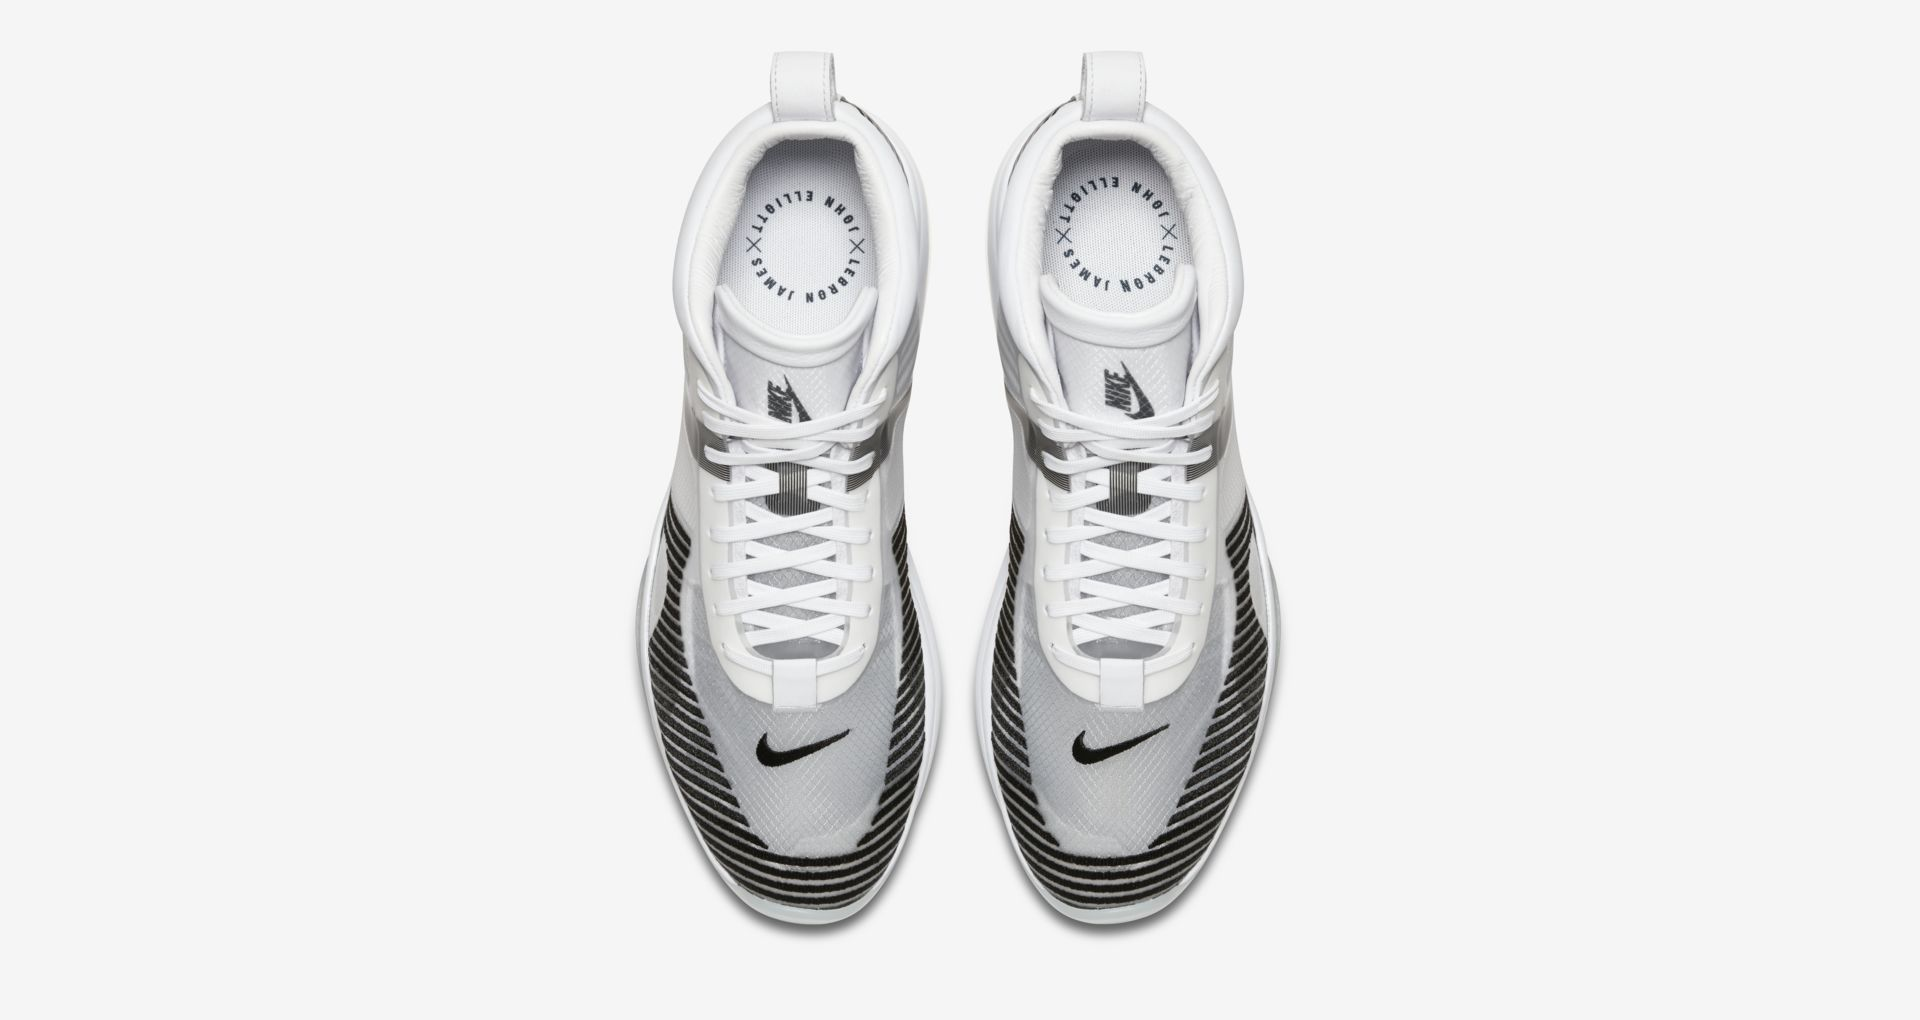 AQ0114 100 John Elliott x Nike LeBron Icon QS 3